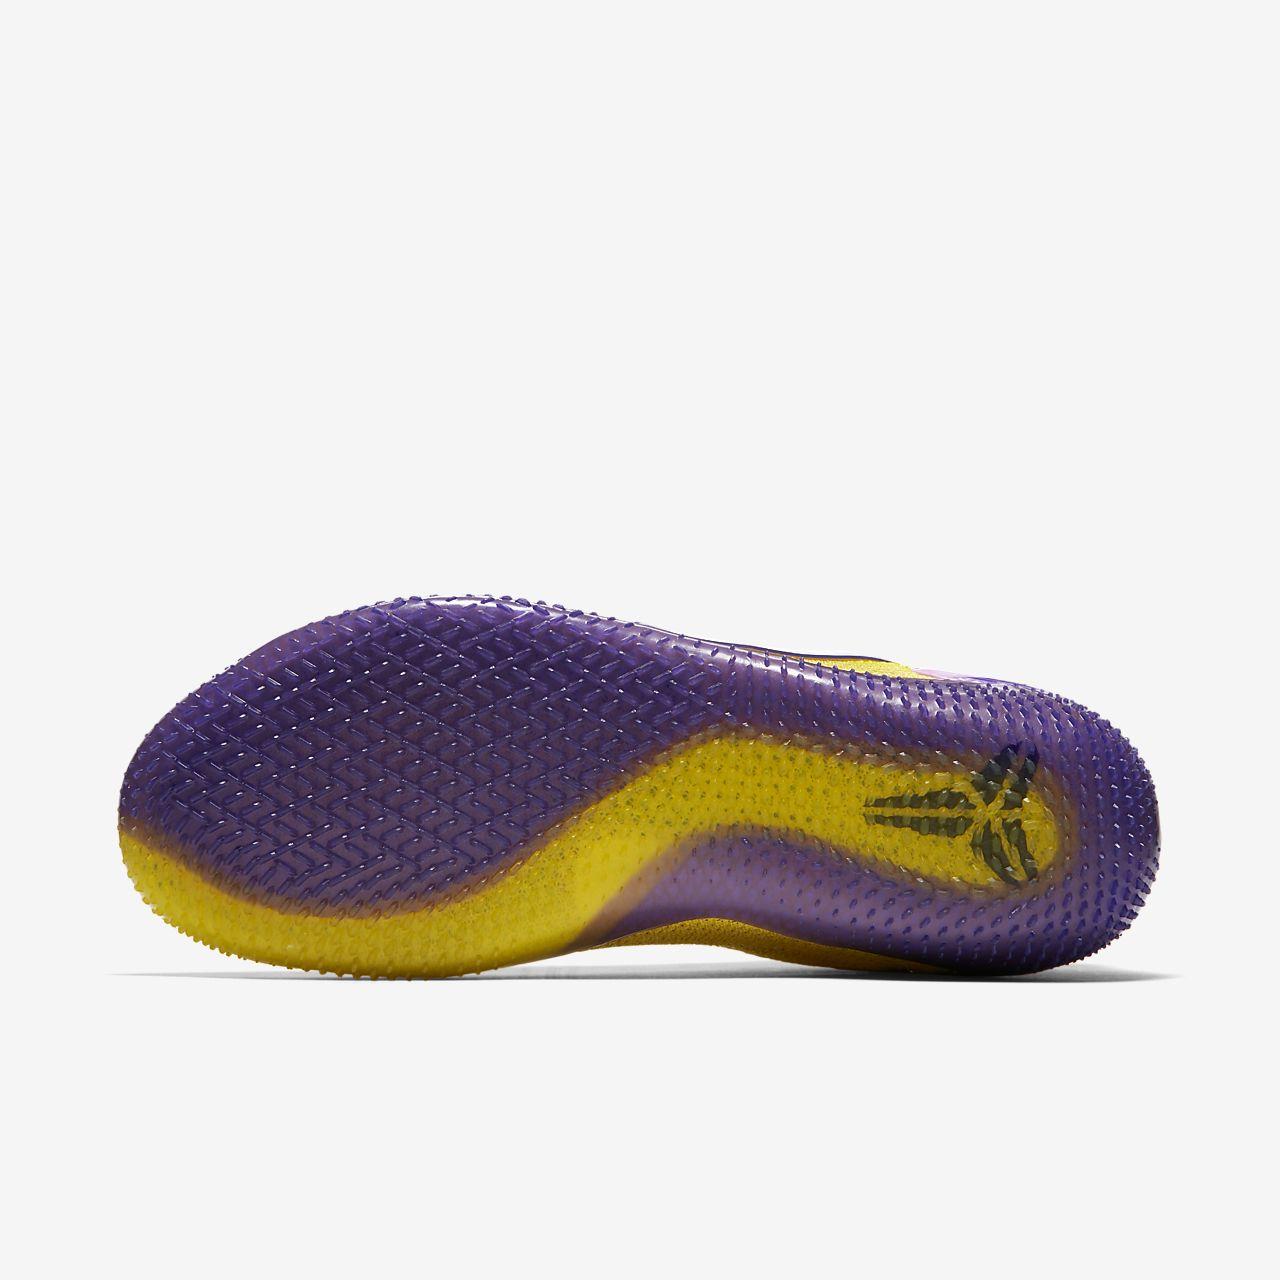 b4001666c74 Kobe A.D. NXT 360 Basketball Shoe. Nike.com HU